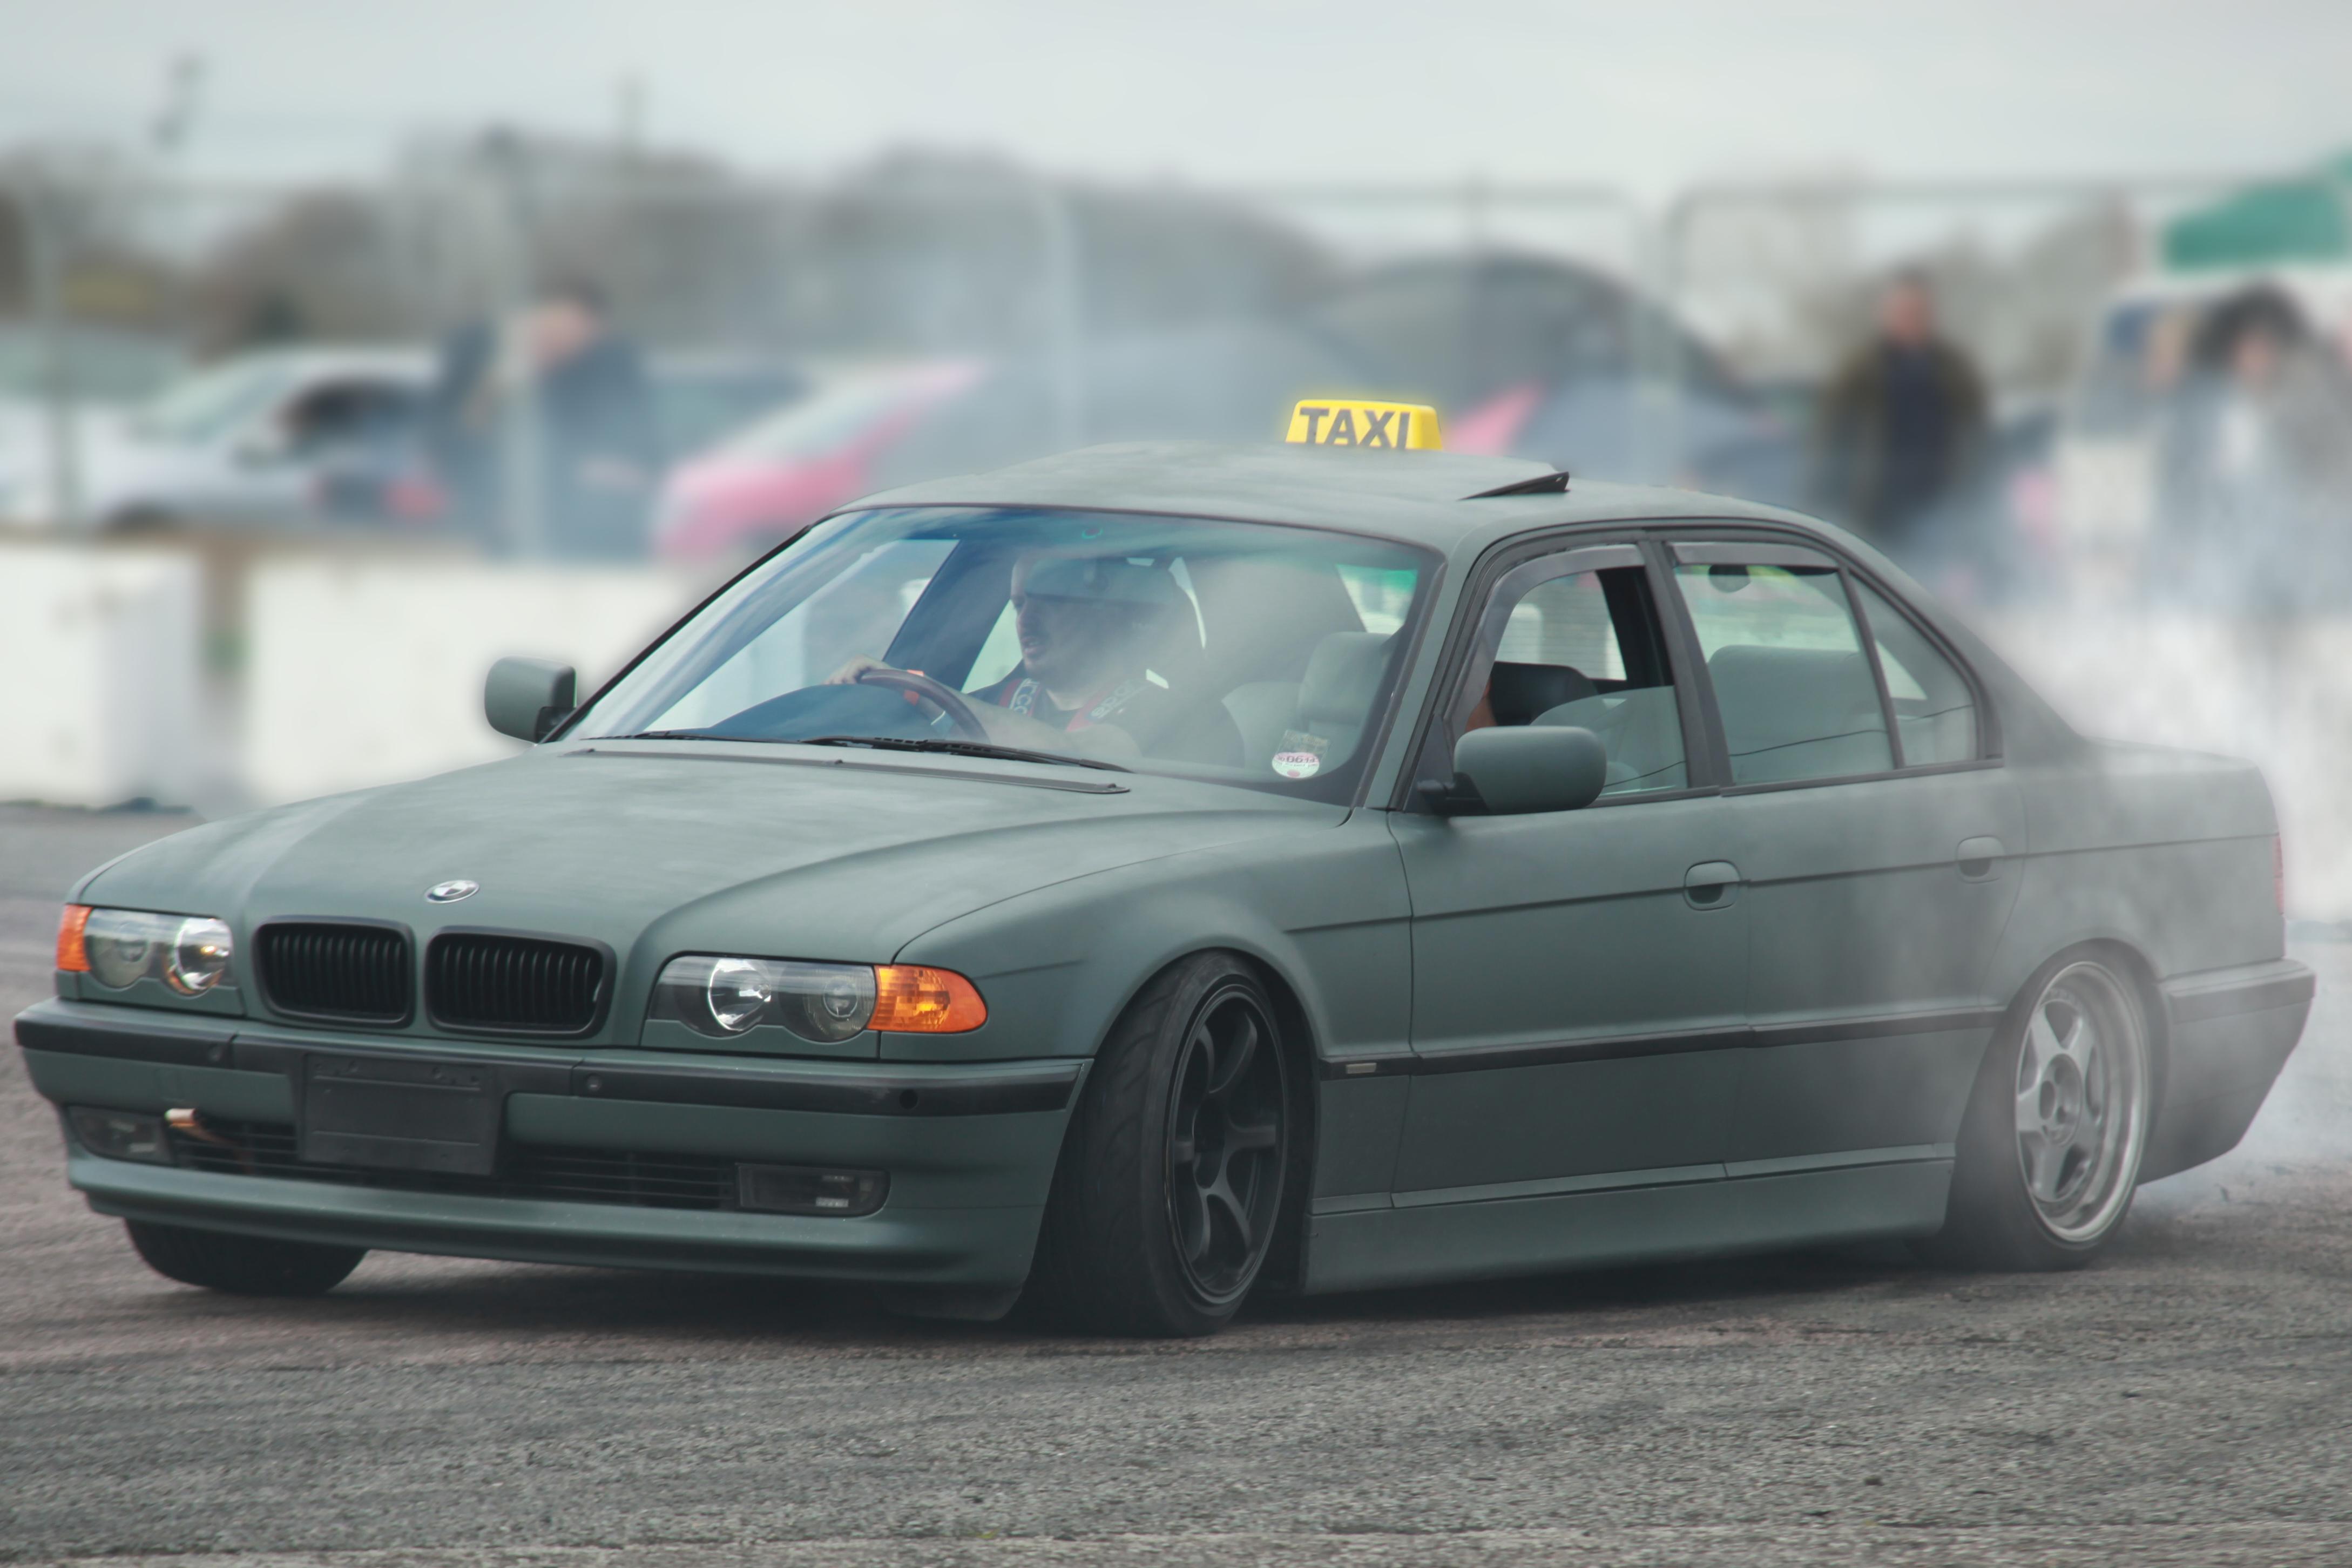 drifting taxi